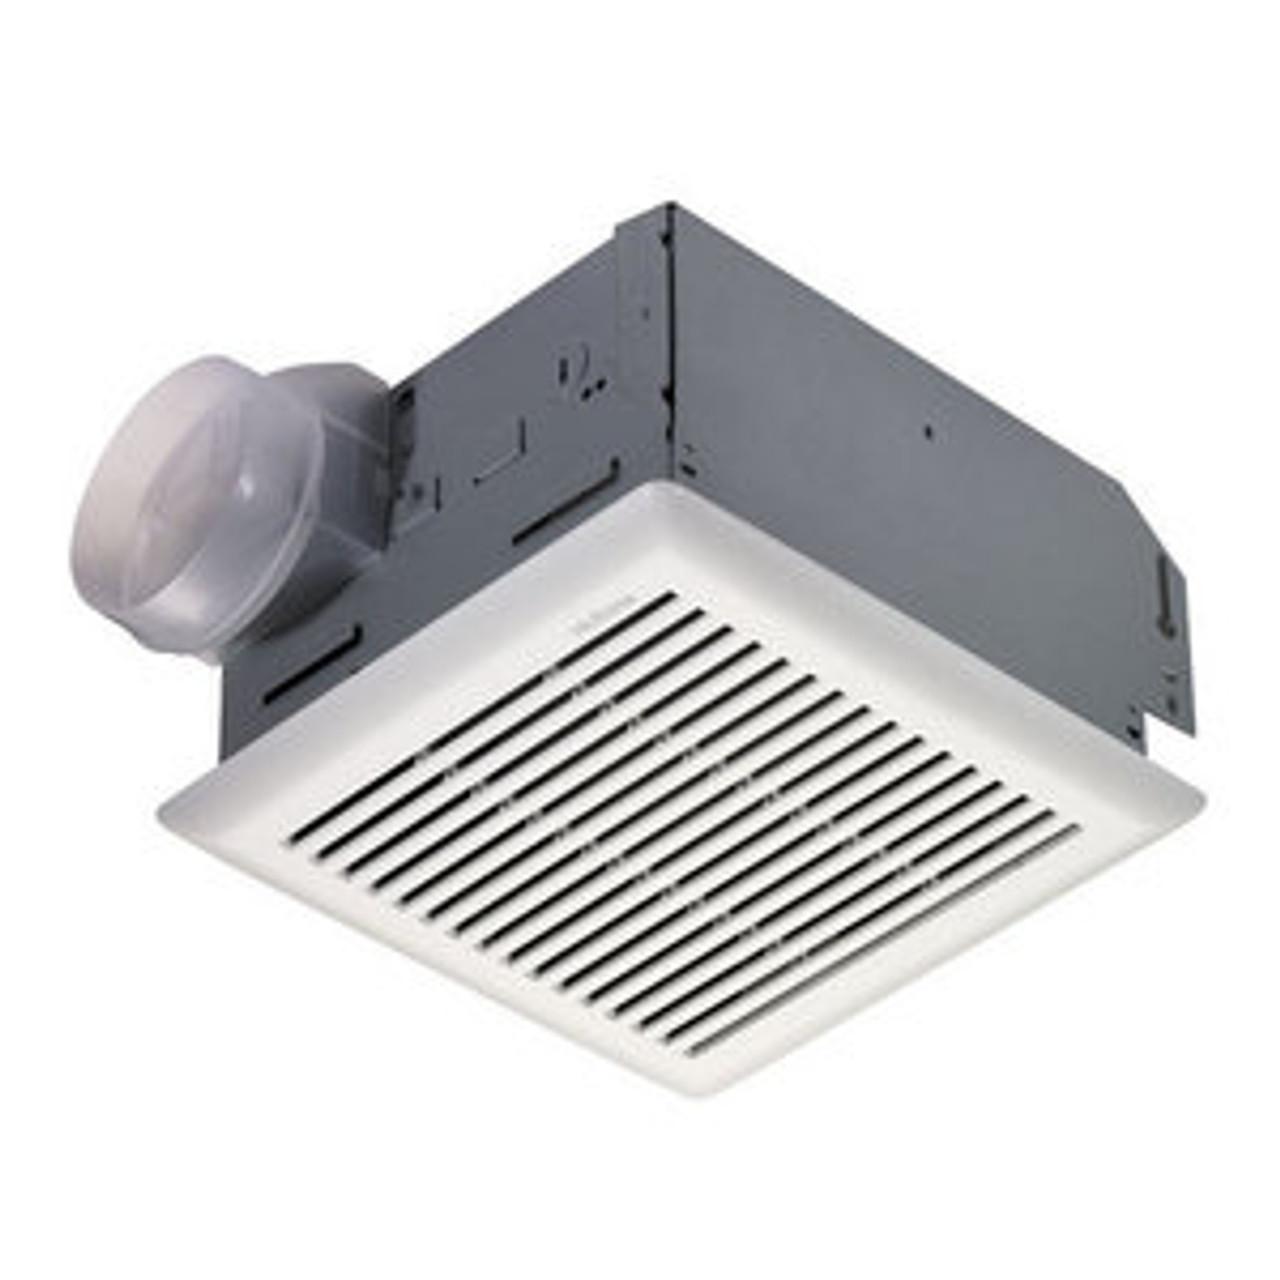 Broan-Nutone 682NT Duct-Free Bathroom Ventilation Fan